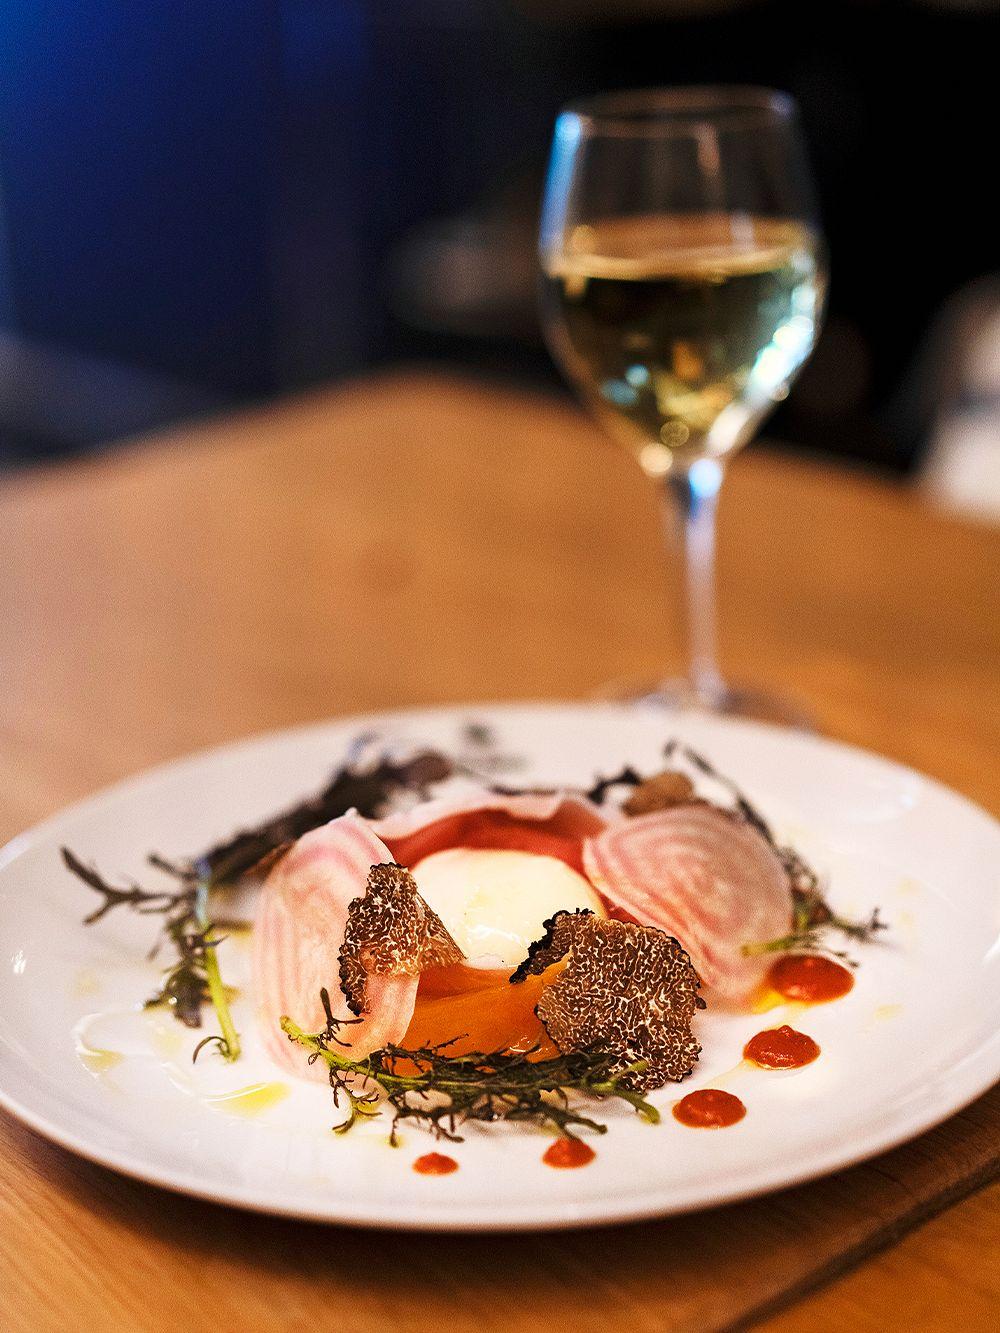 The Artisan de la Truffe restaurant in Paris